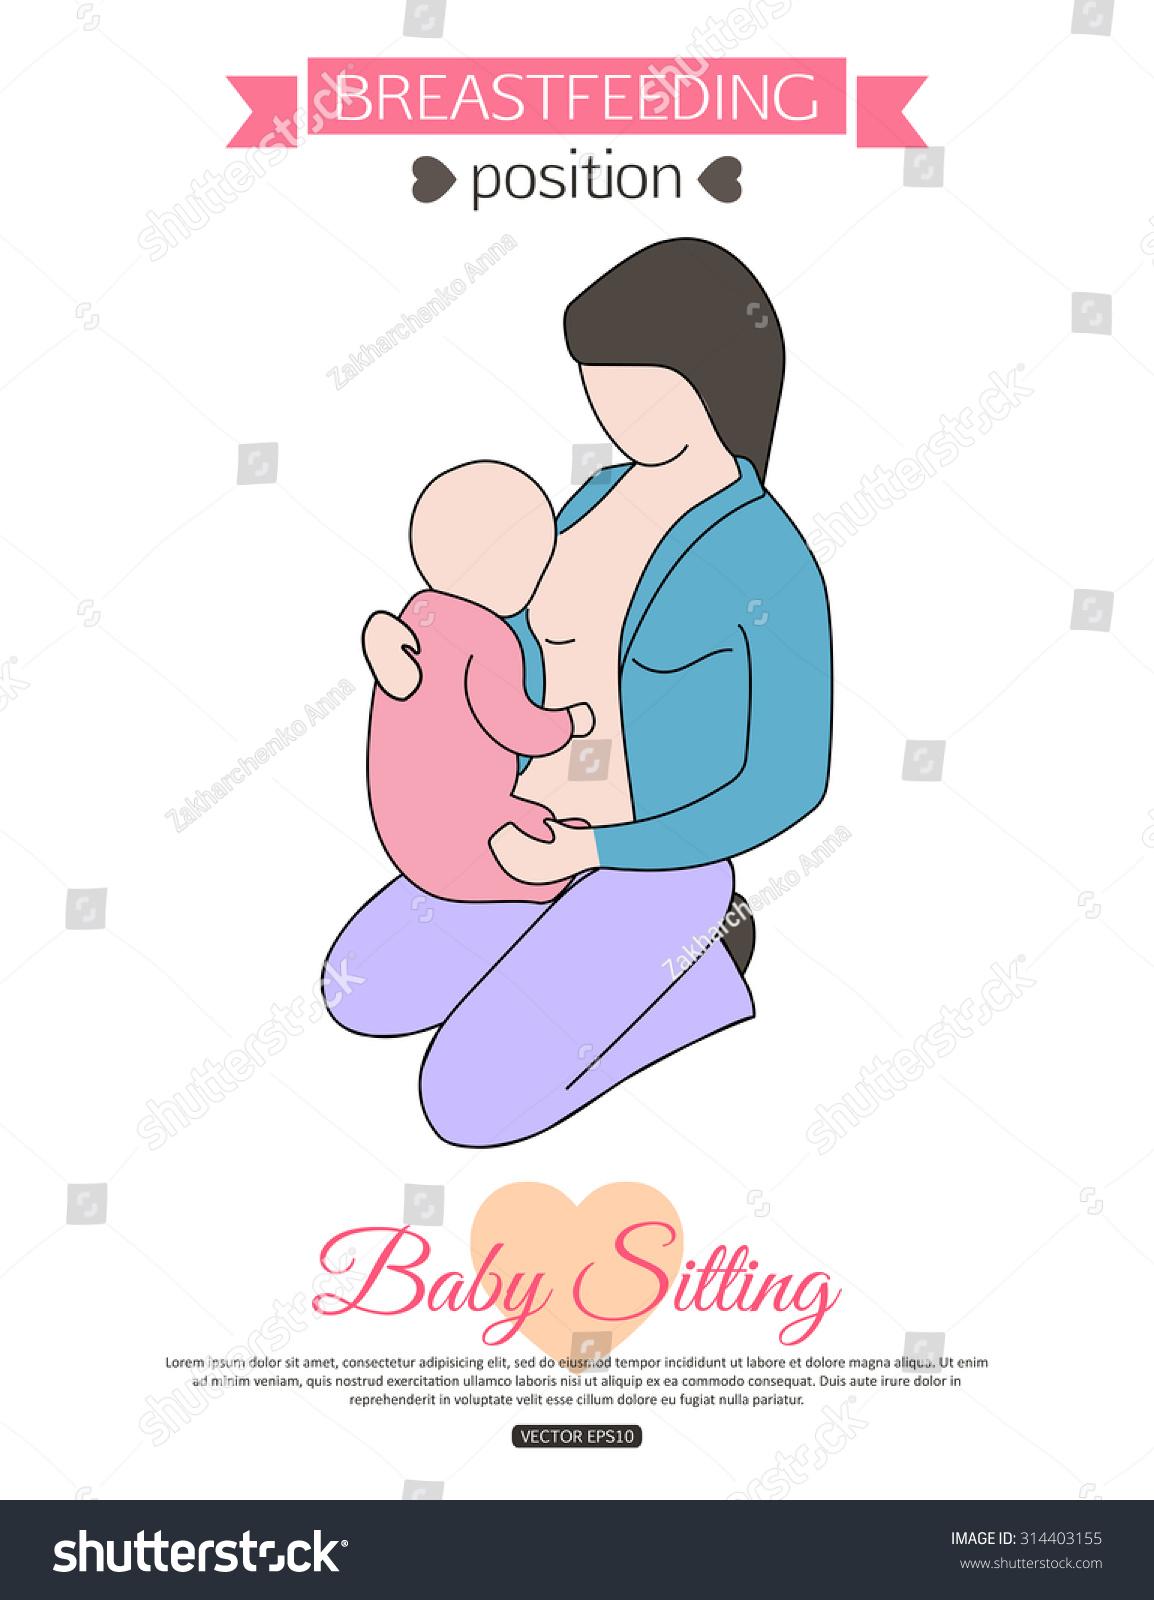 pose breastfeeding breastfeeding position baby sitting stock pose for breastfeeding breastfeeding position baby sitting baby food vector illustration